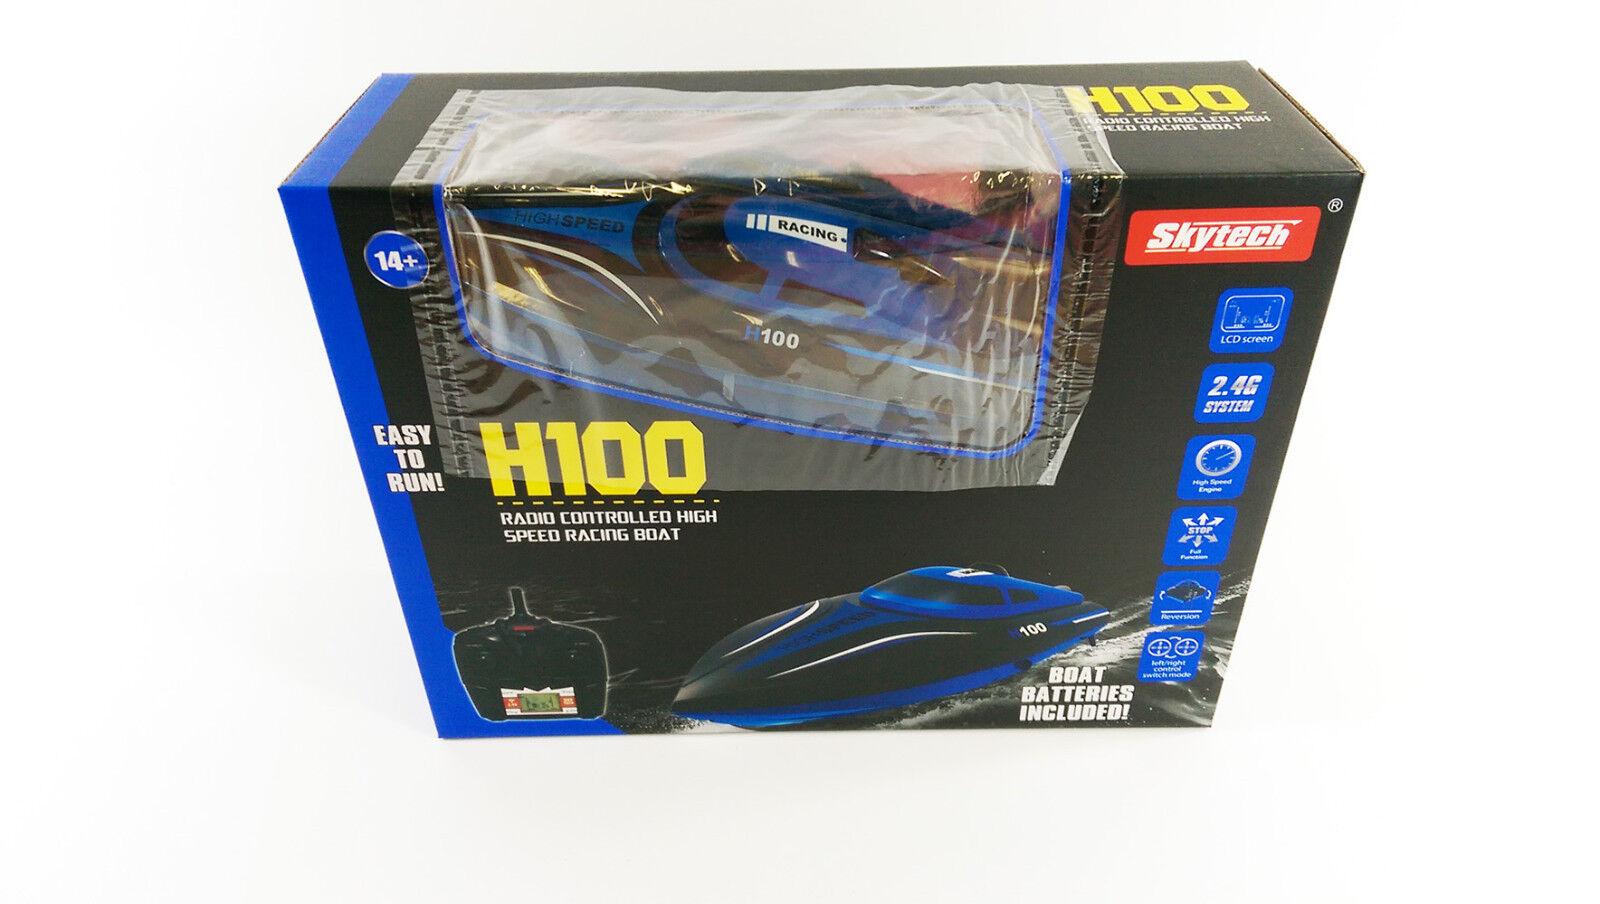 Funkfernsteuerung rc - high - speed racing Stiefel rtr 2.4ghz selbst korrigieren.